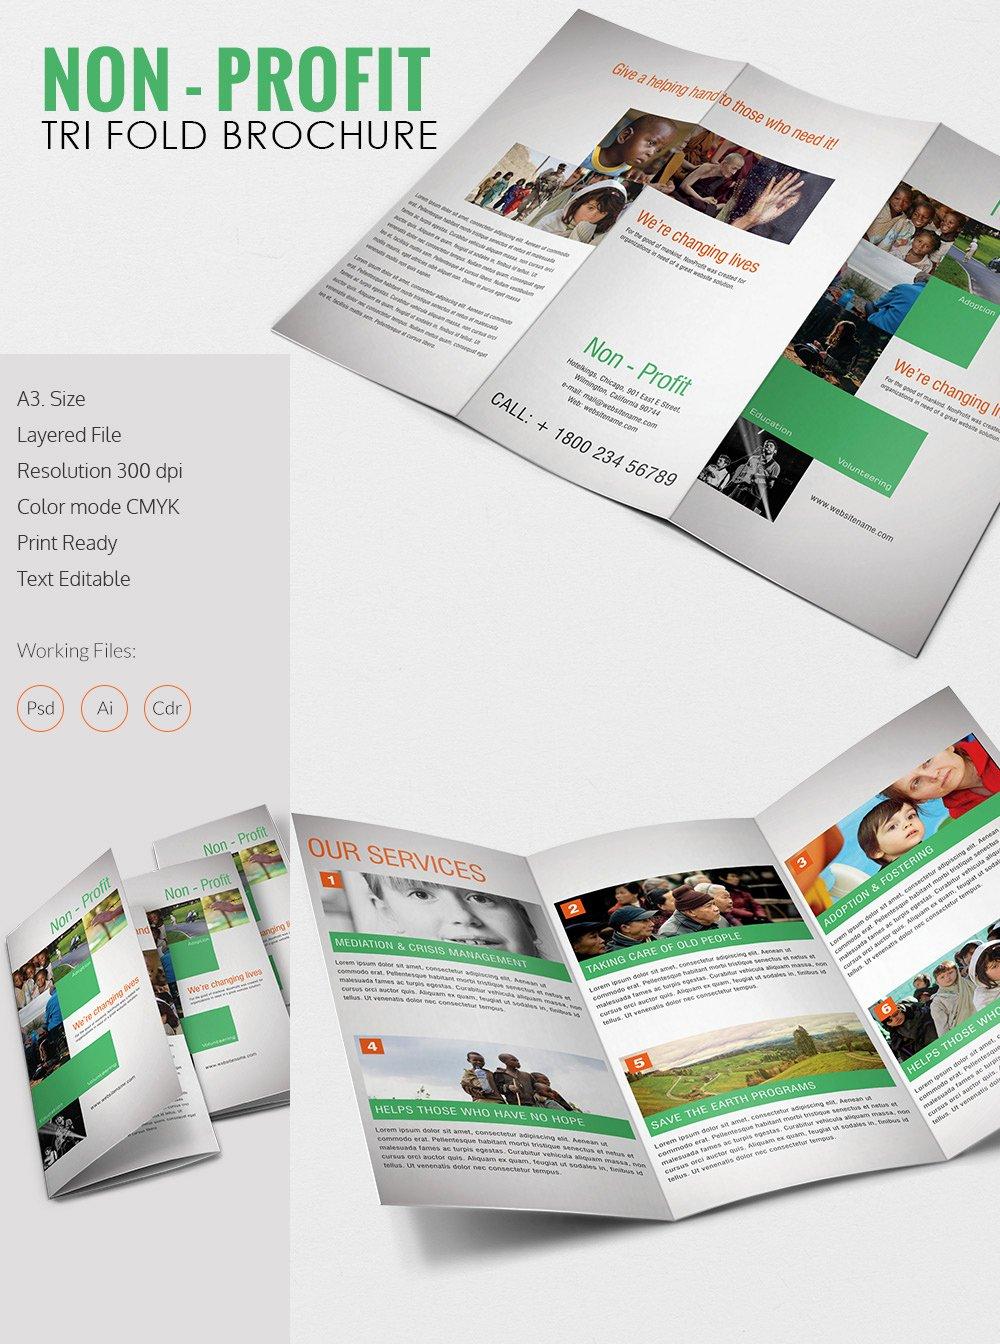 Tri Fold Brochure Free Template Luxury Tri Fold Brochure Template – 45 Free Word Pdf Psd Eps